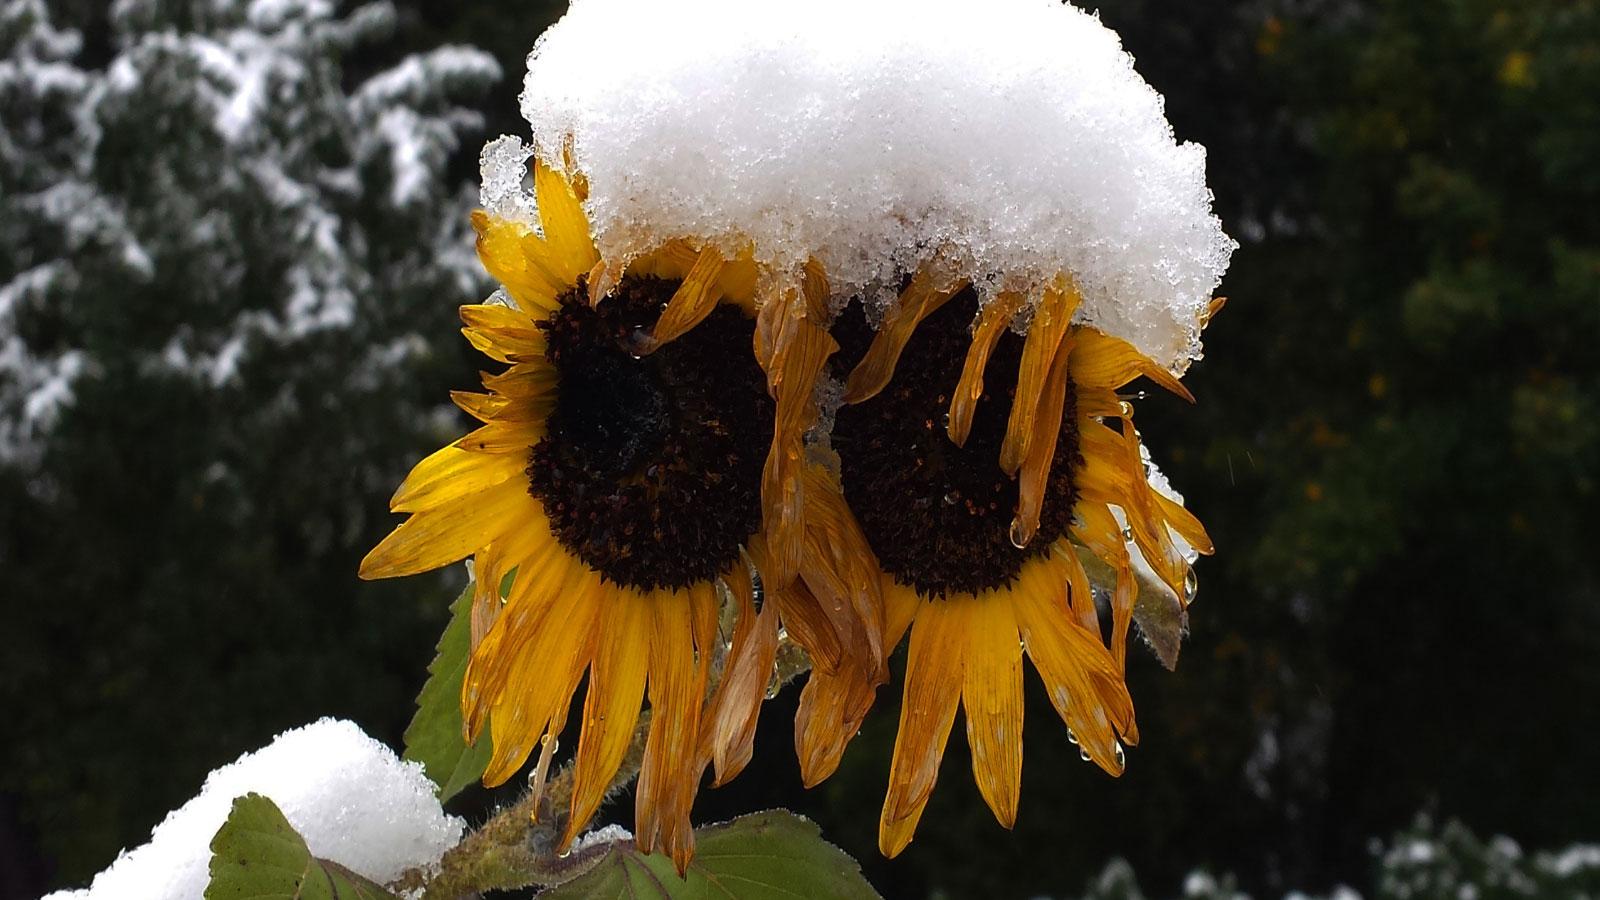 Snow on sunflower